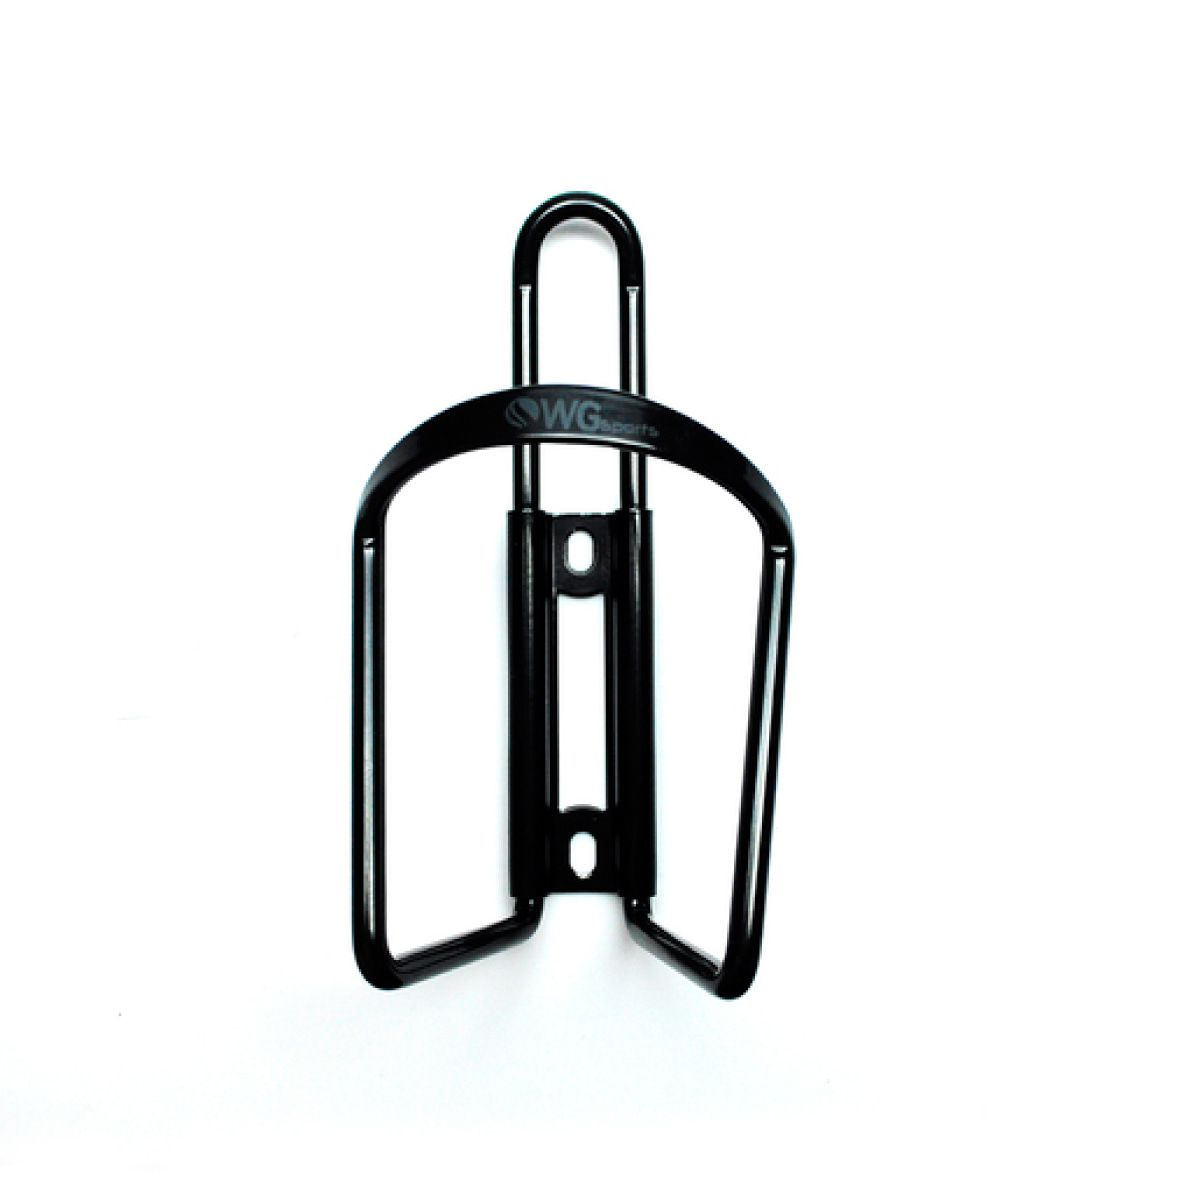 Kit Pedal Iniciante Farol Traseiro/ Dianteiro + Garrafa + Suporte de Alumínio